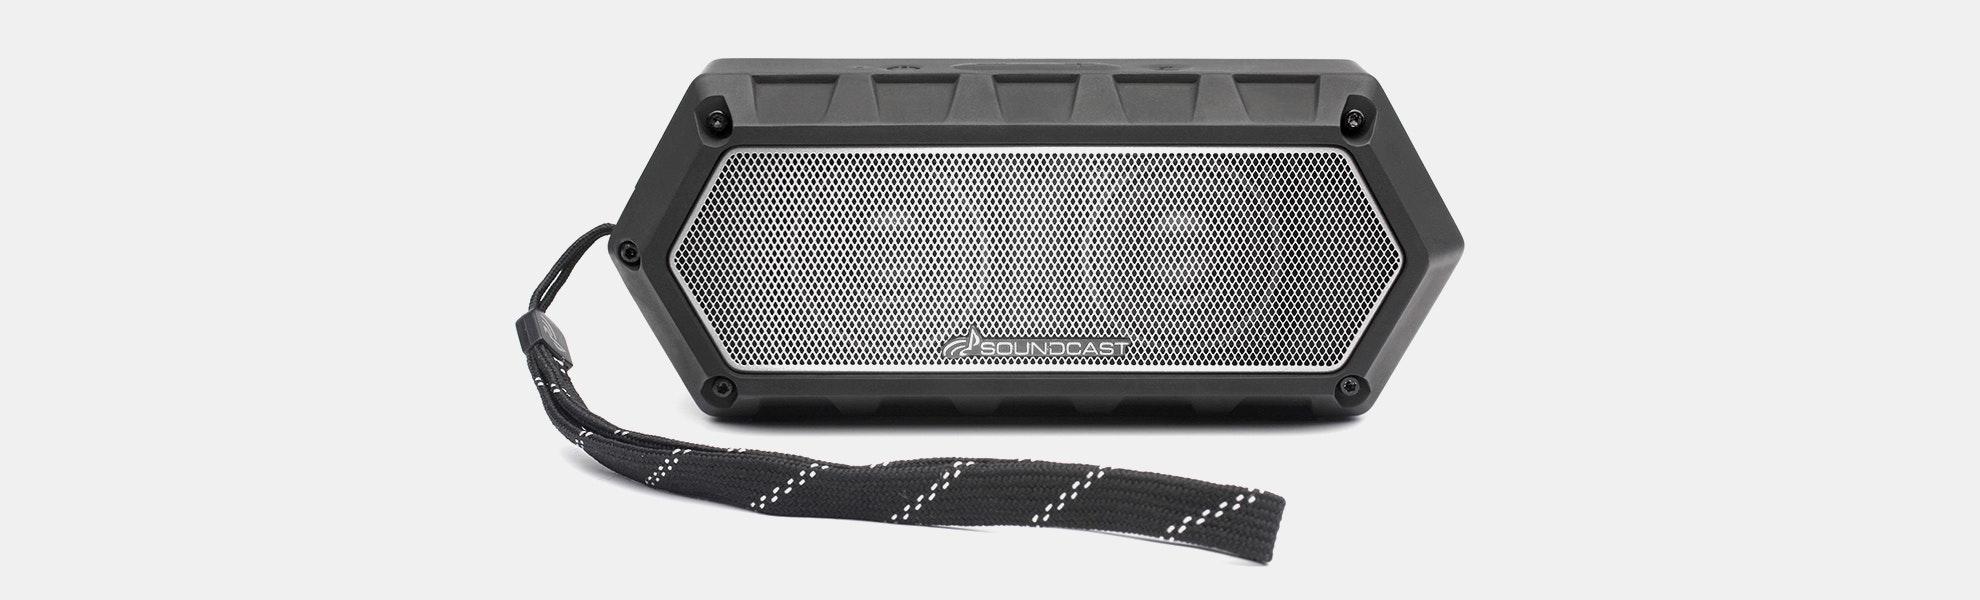 Soundcast VG1 Waterproof Bluetooth Speaker